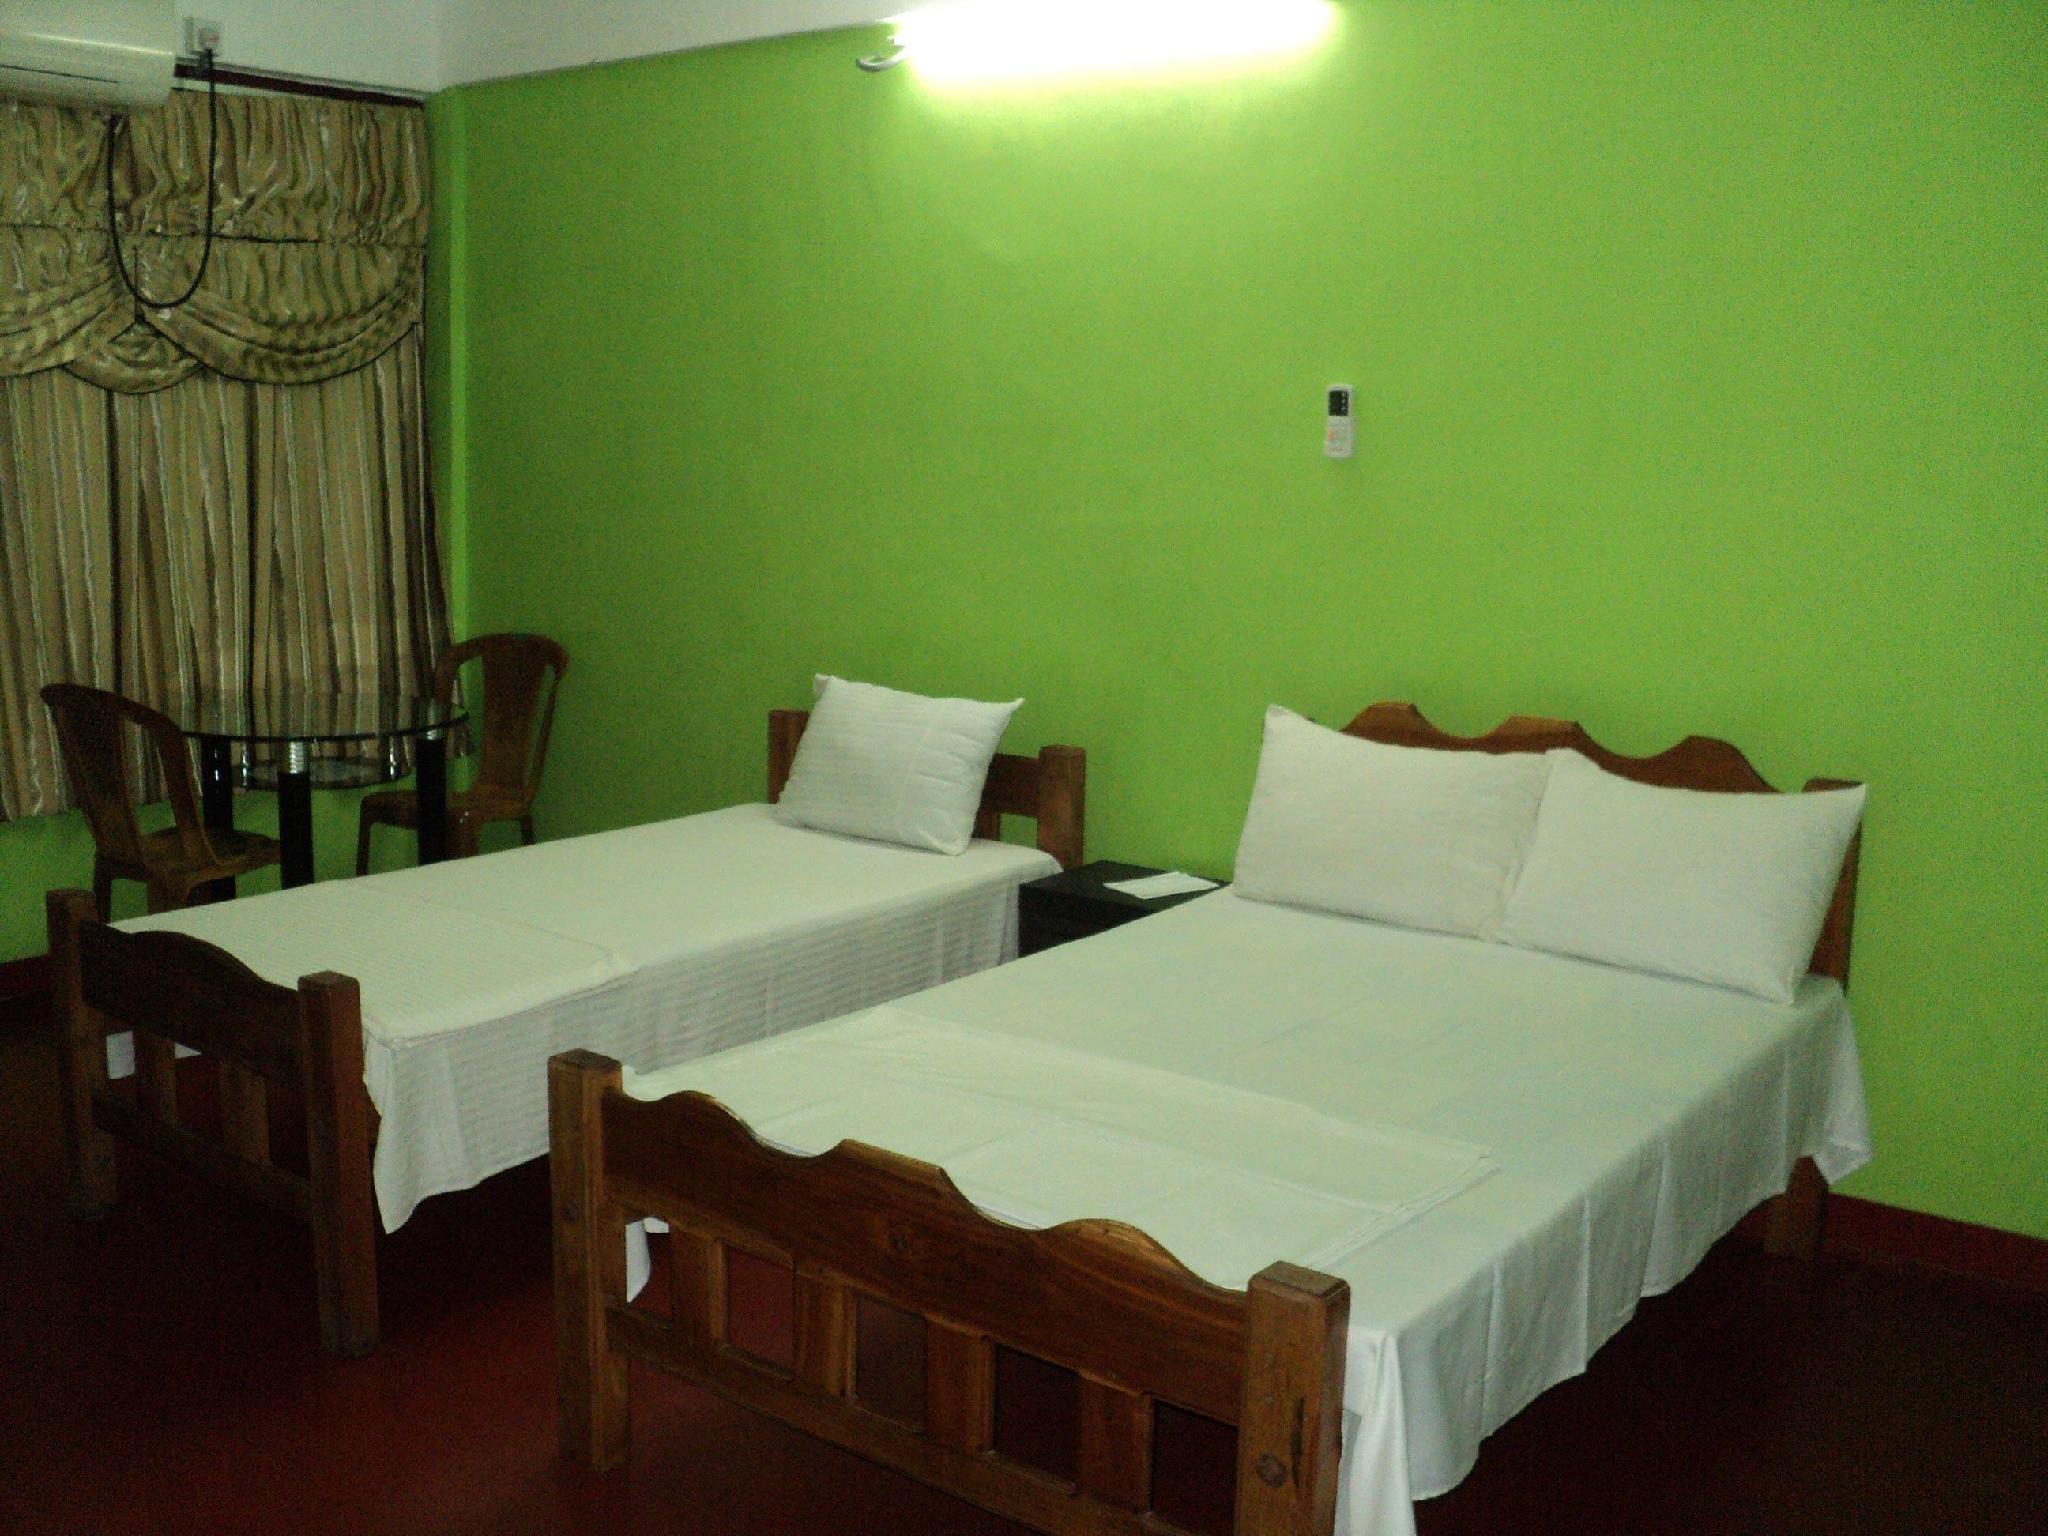 AKR Hotel Jaffna, Karachchi